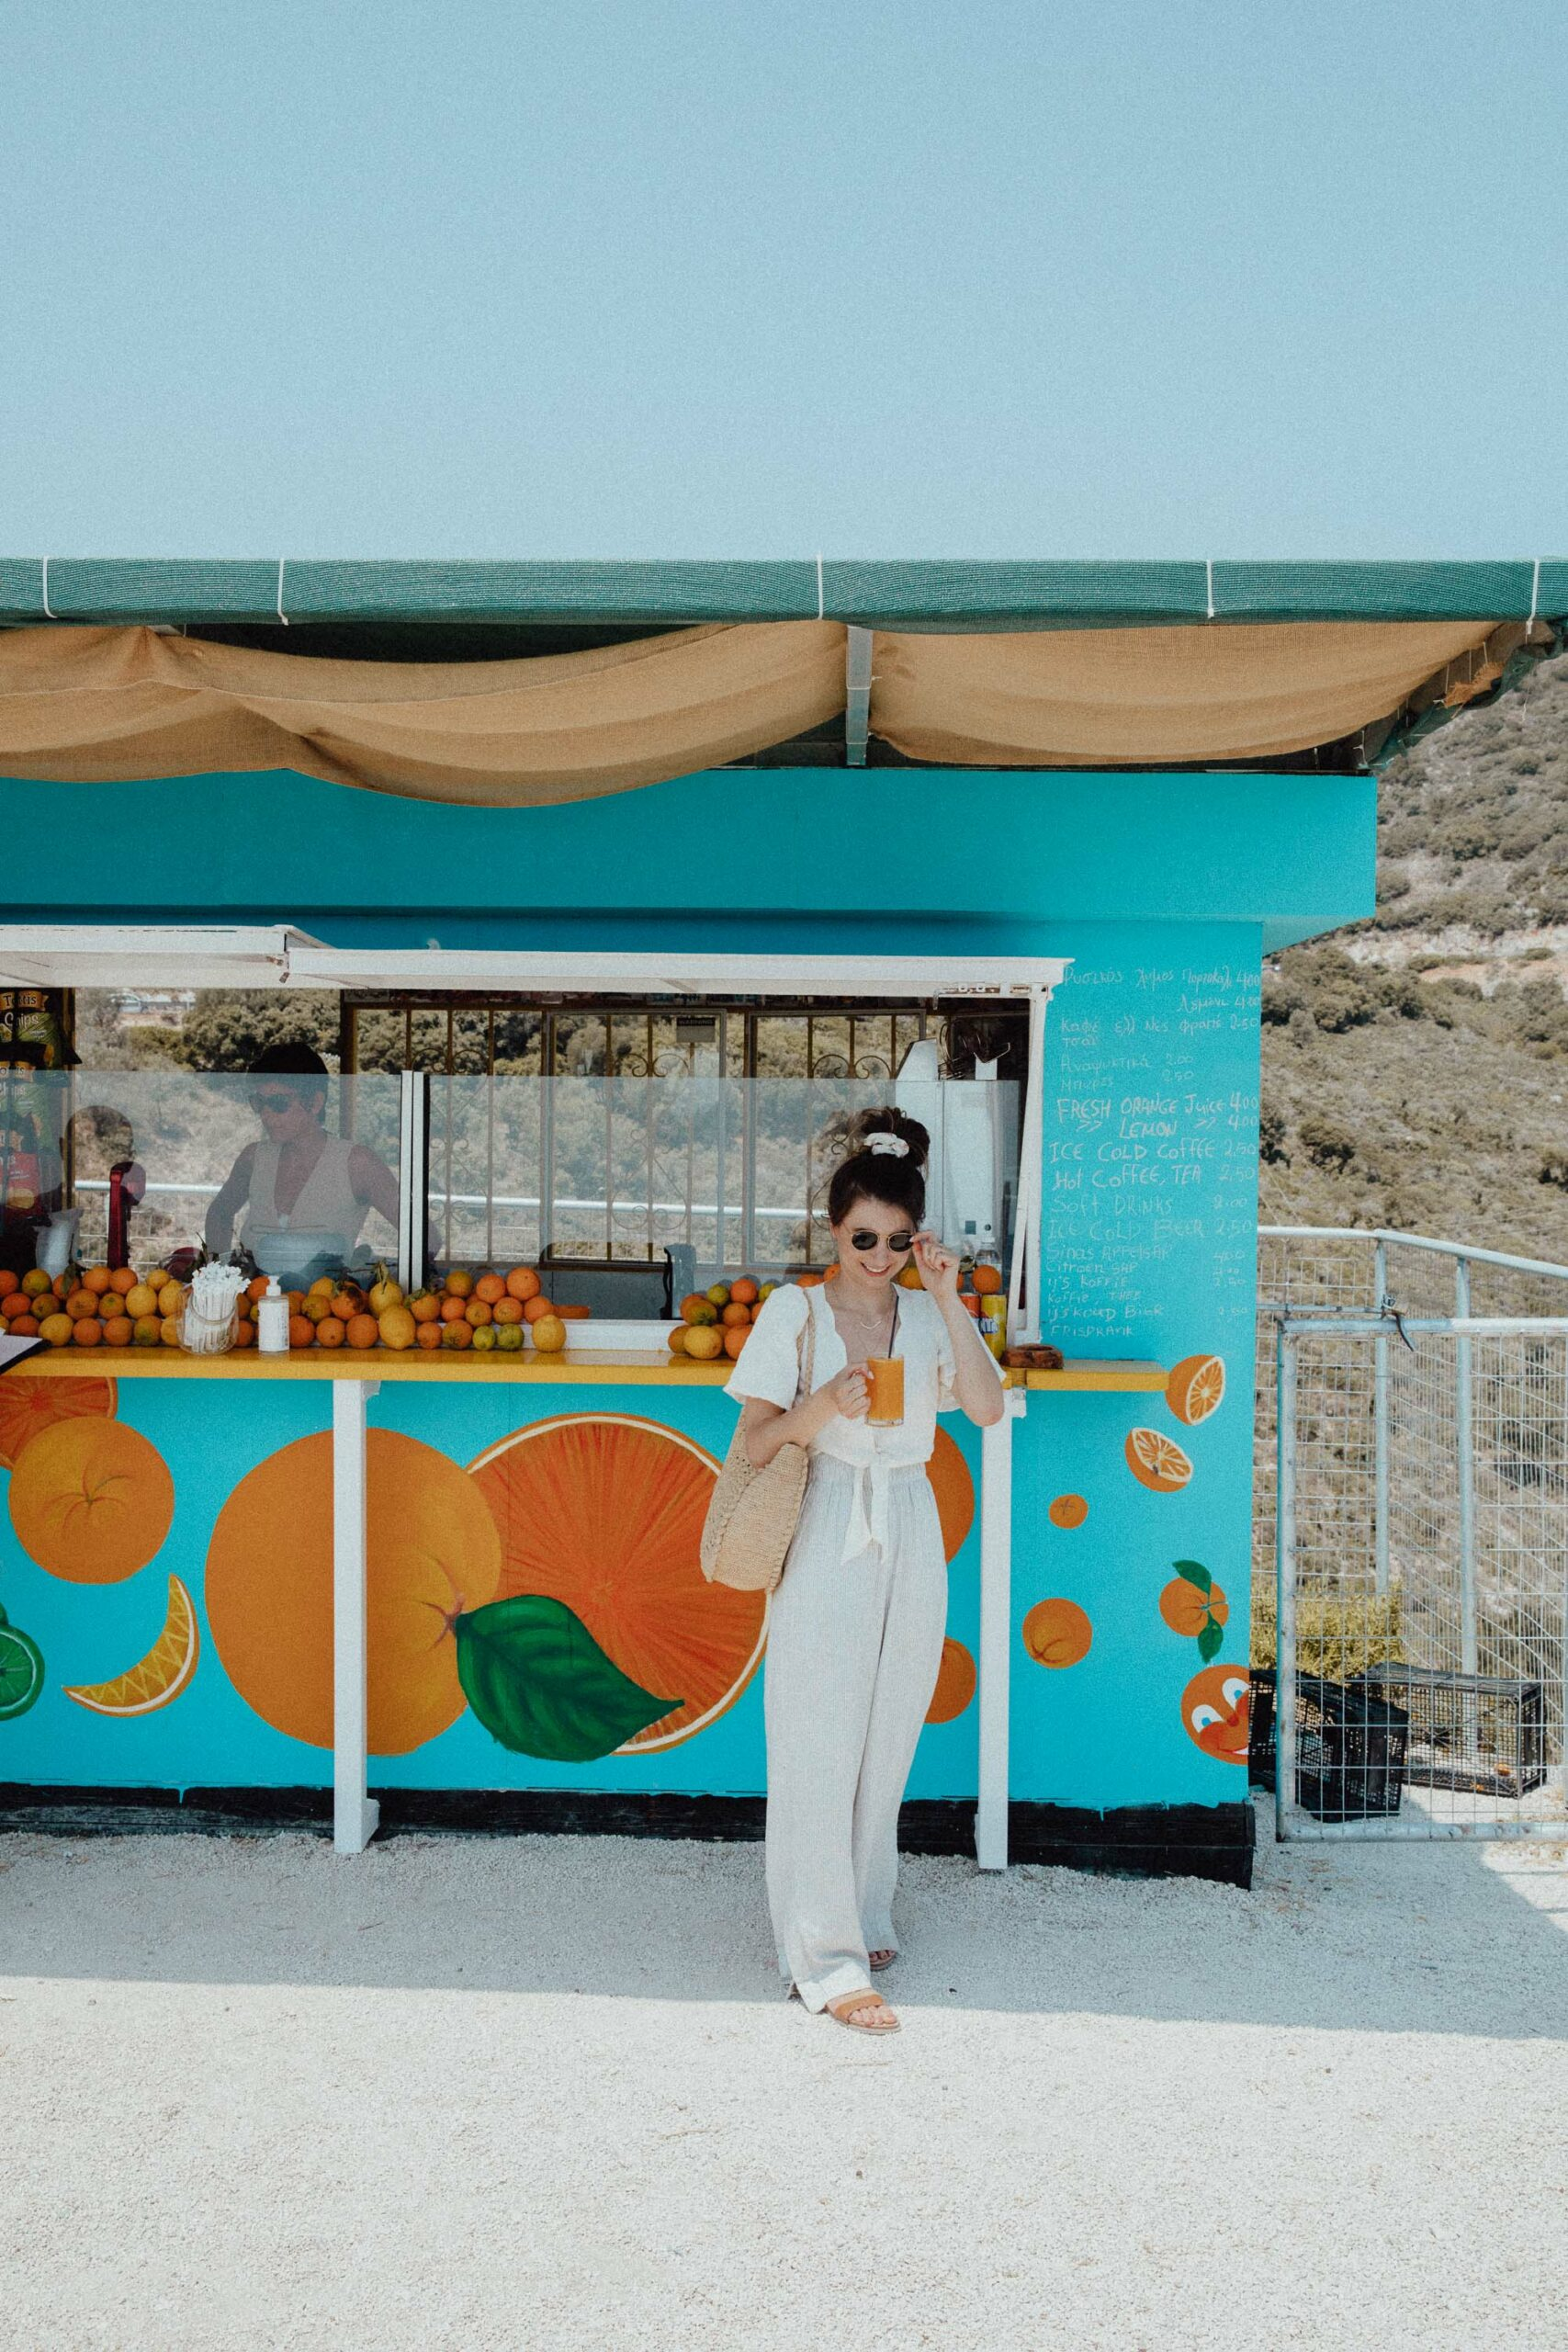 Fresh Orange Juice Bar blue stand with oranges in Zakynthos Greece